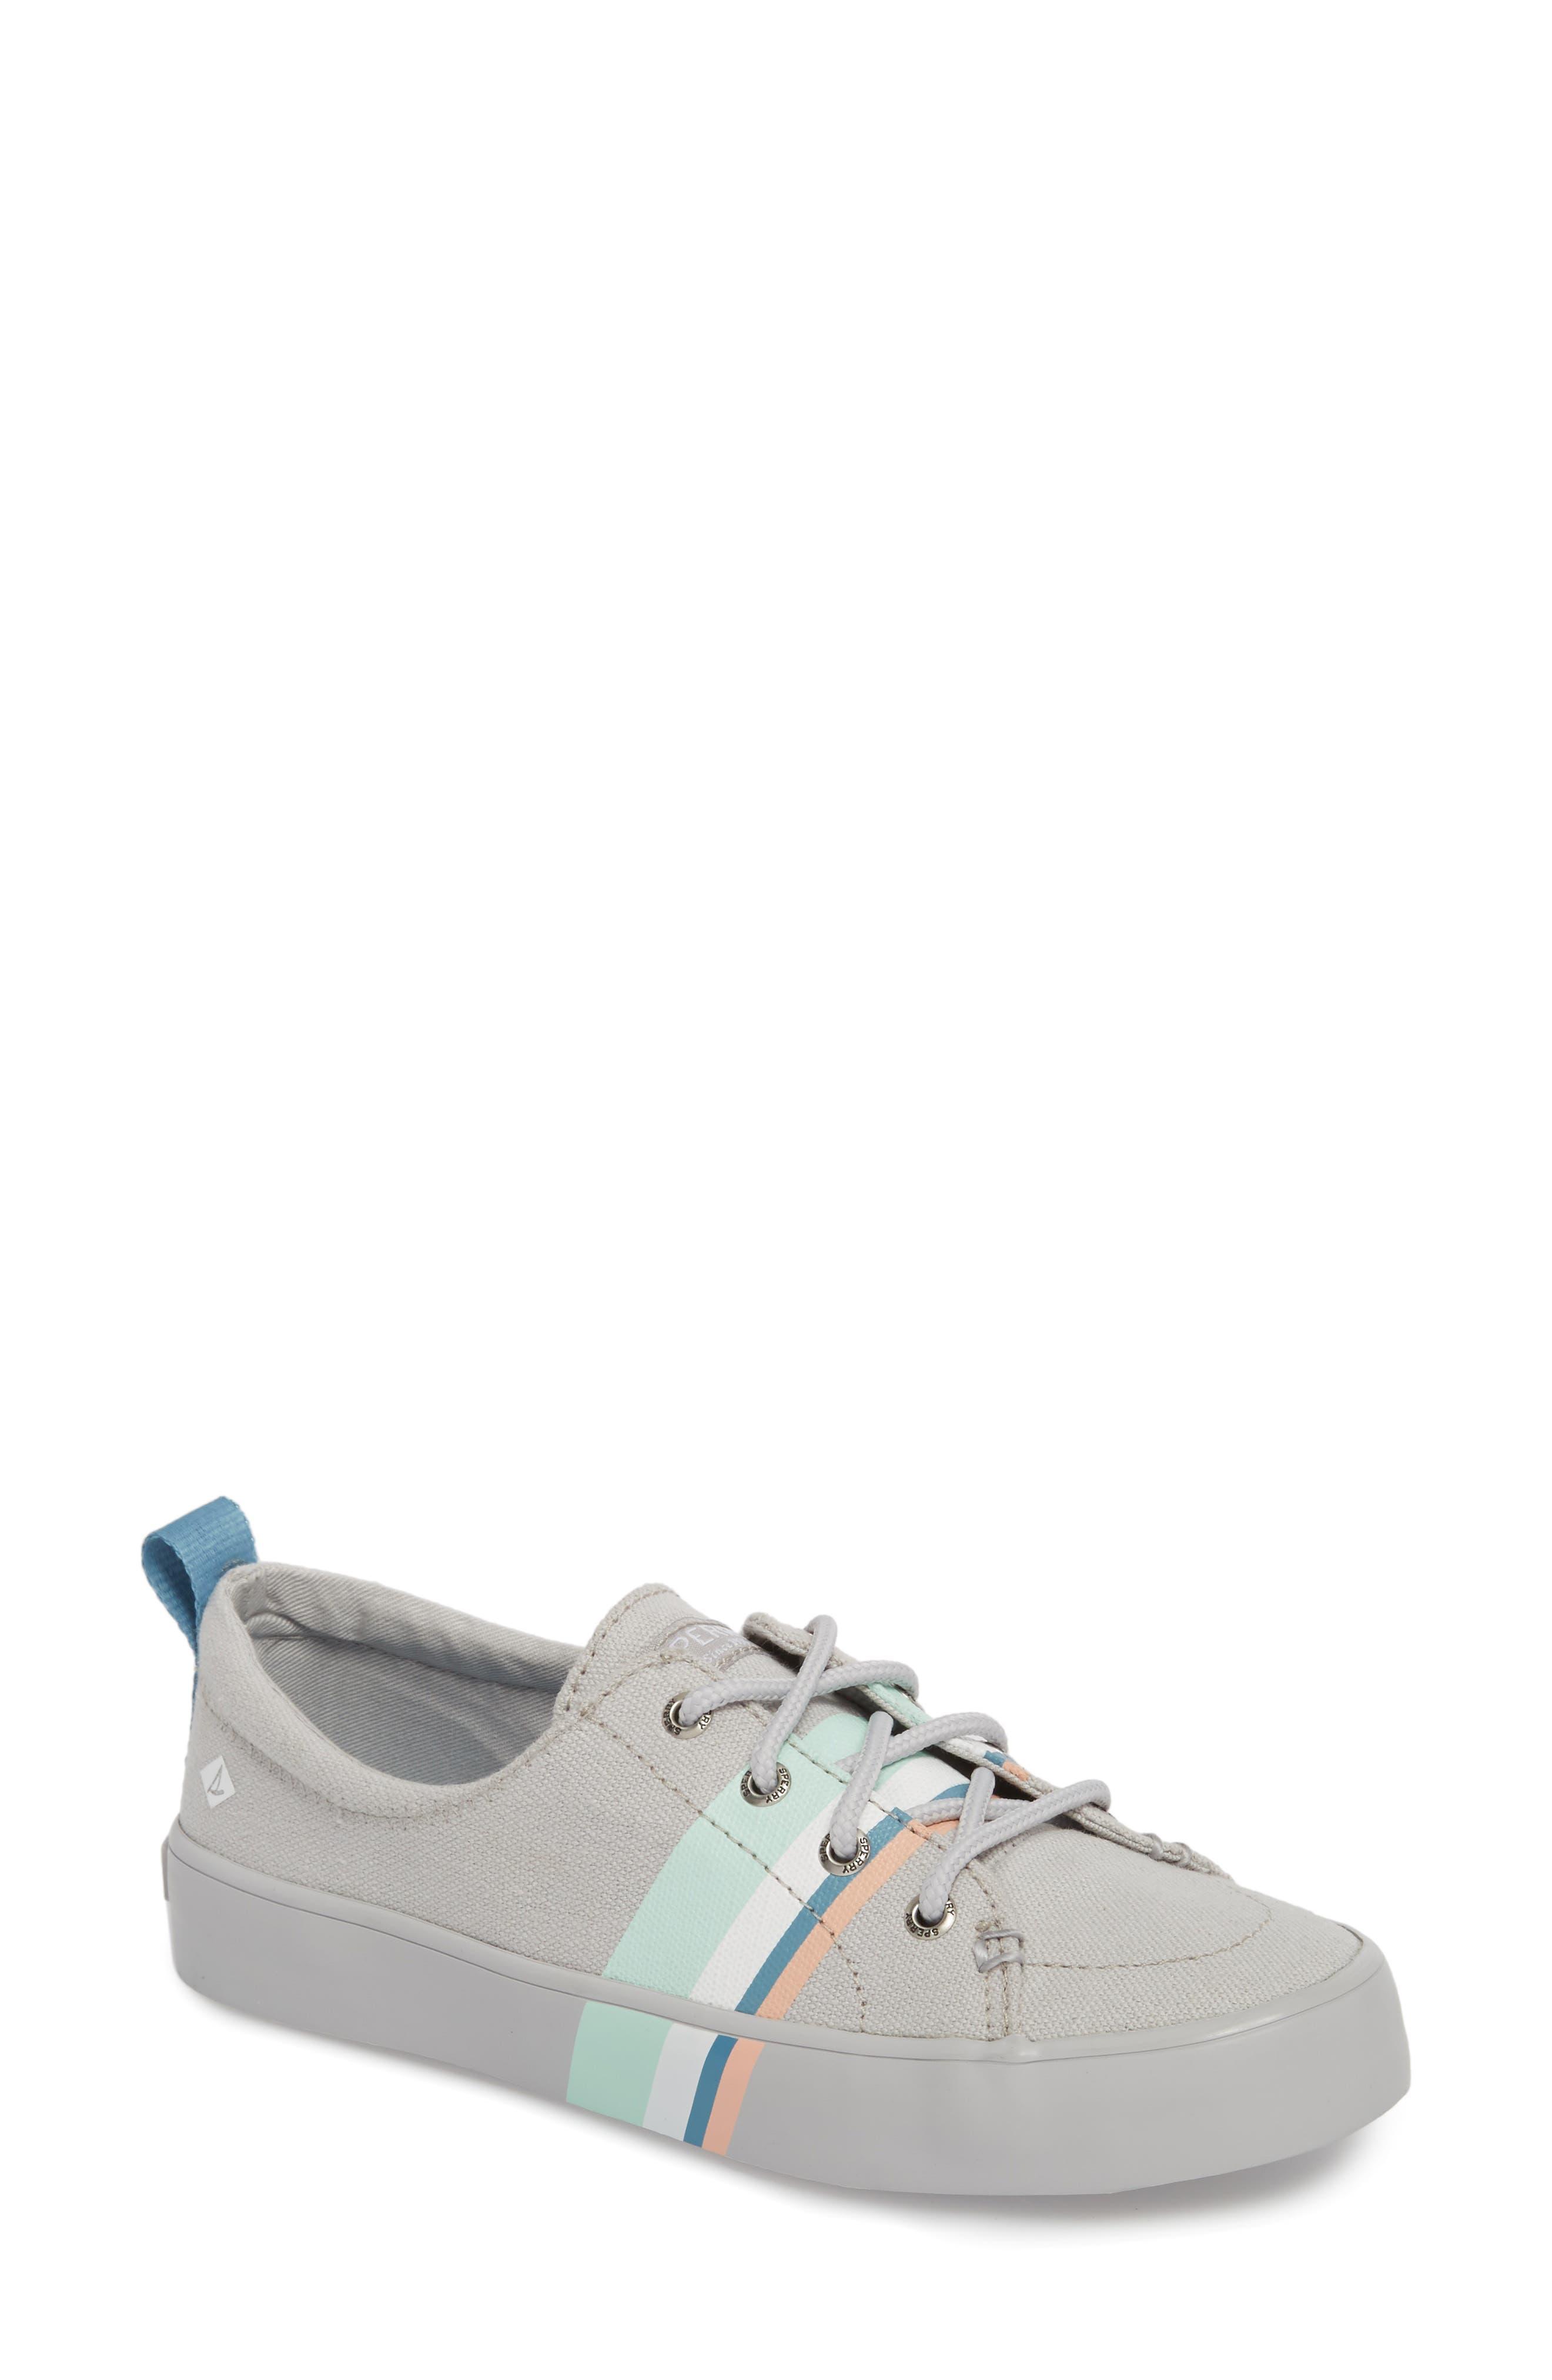 Crest Vibe Slip-On Sneaker,                             Main thumbnail 1, color,                             050